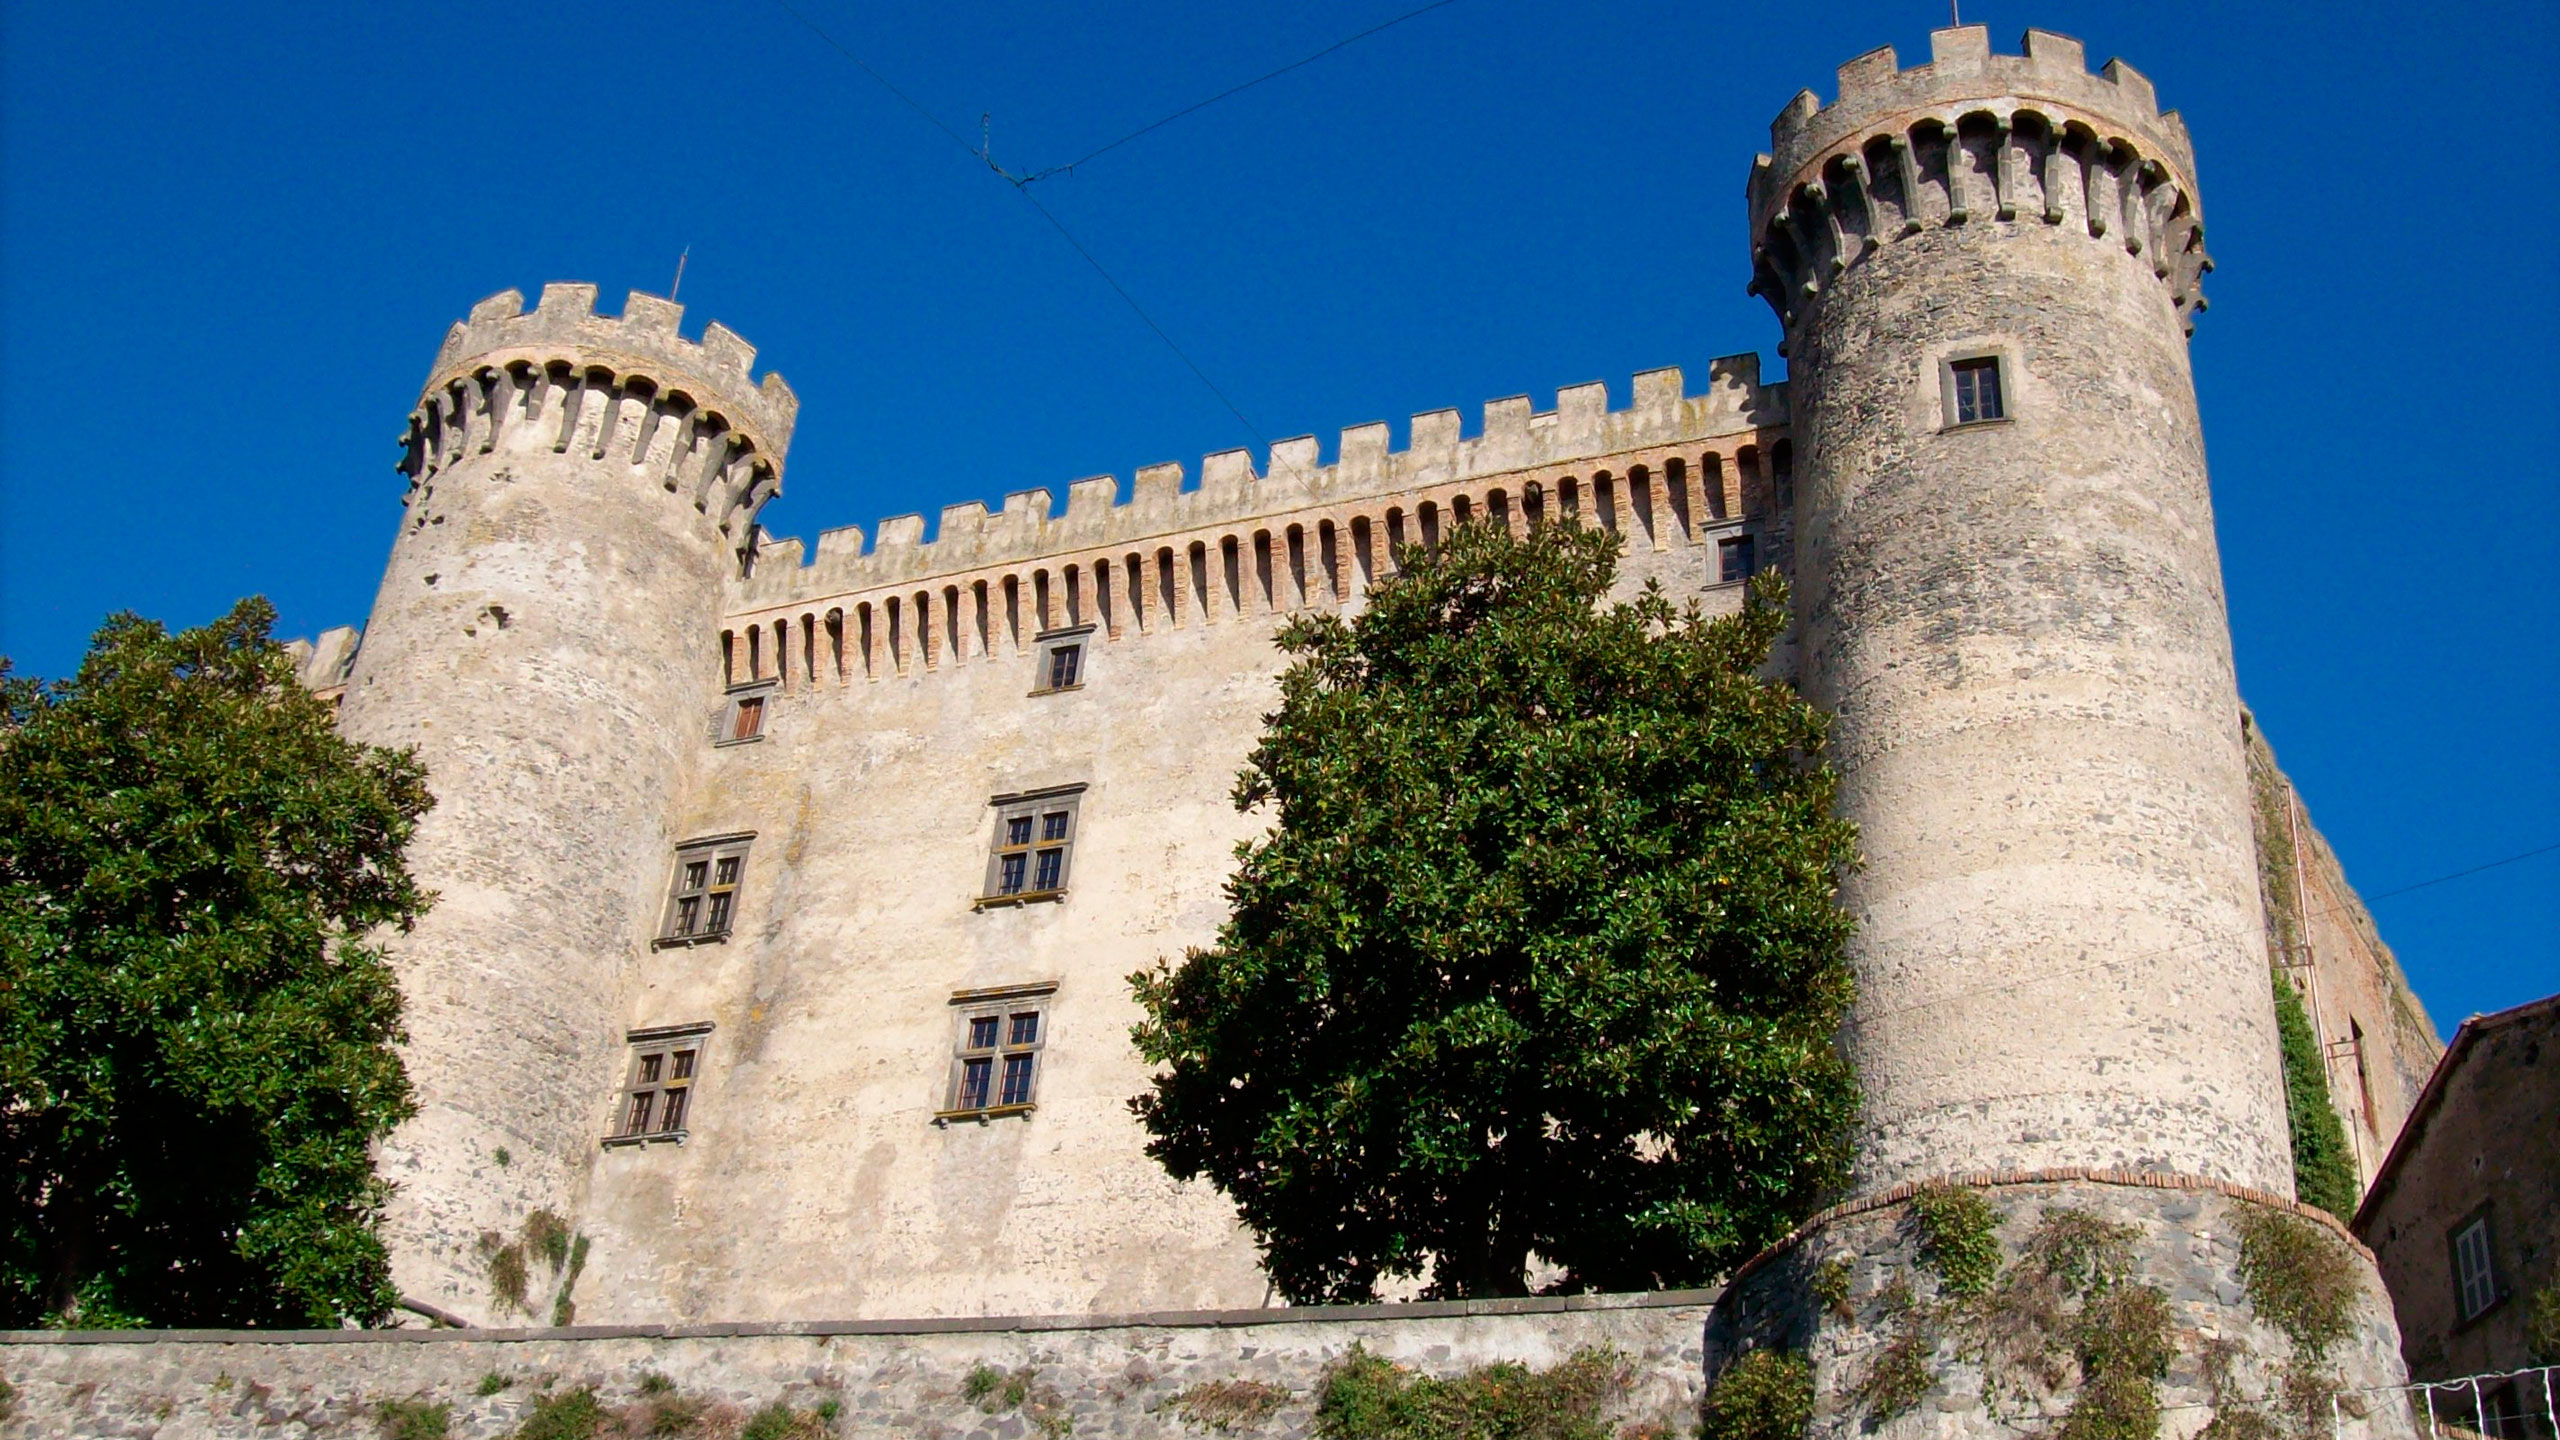 Blog-Rome-Hints-The-Inn-at-the-Roman-Forum-Rome